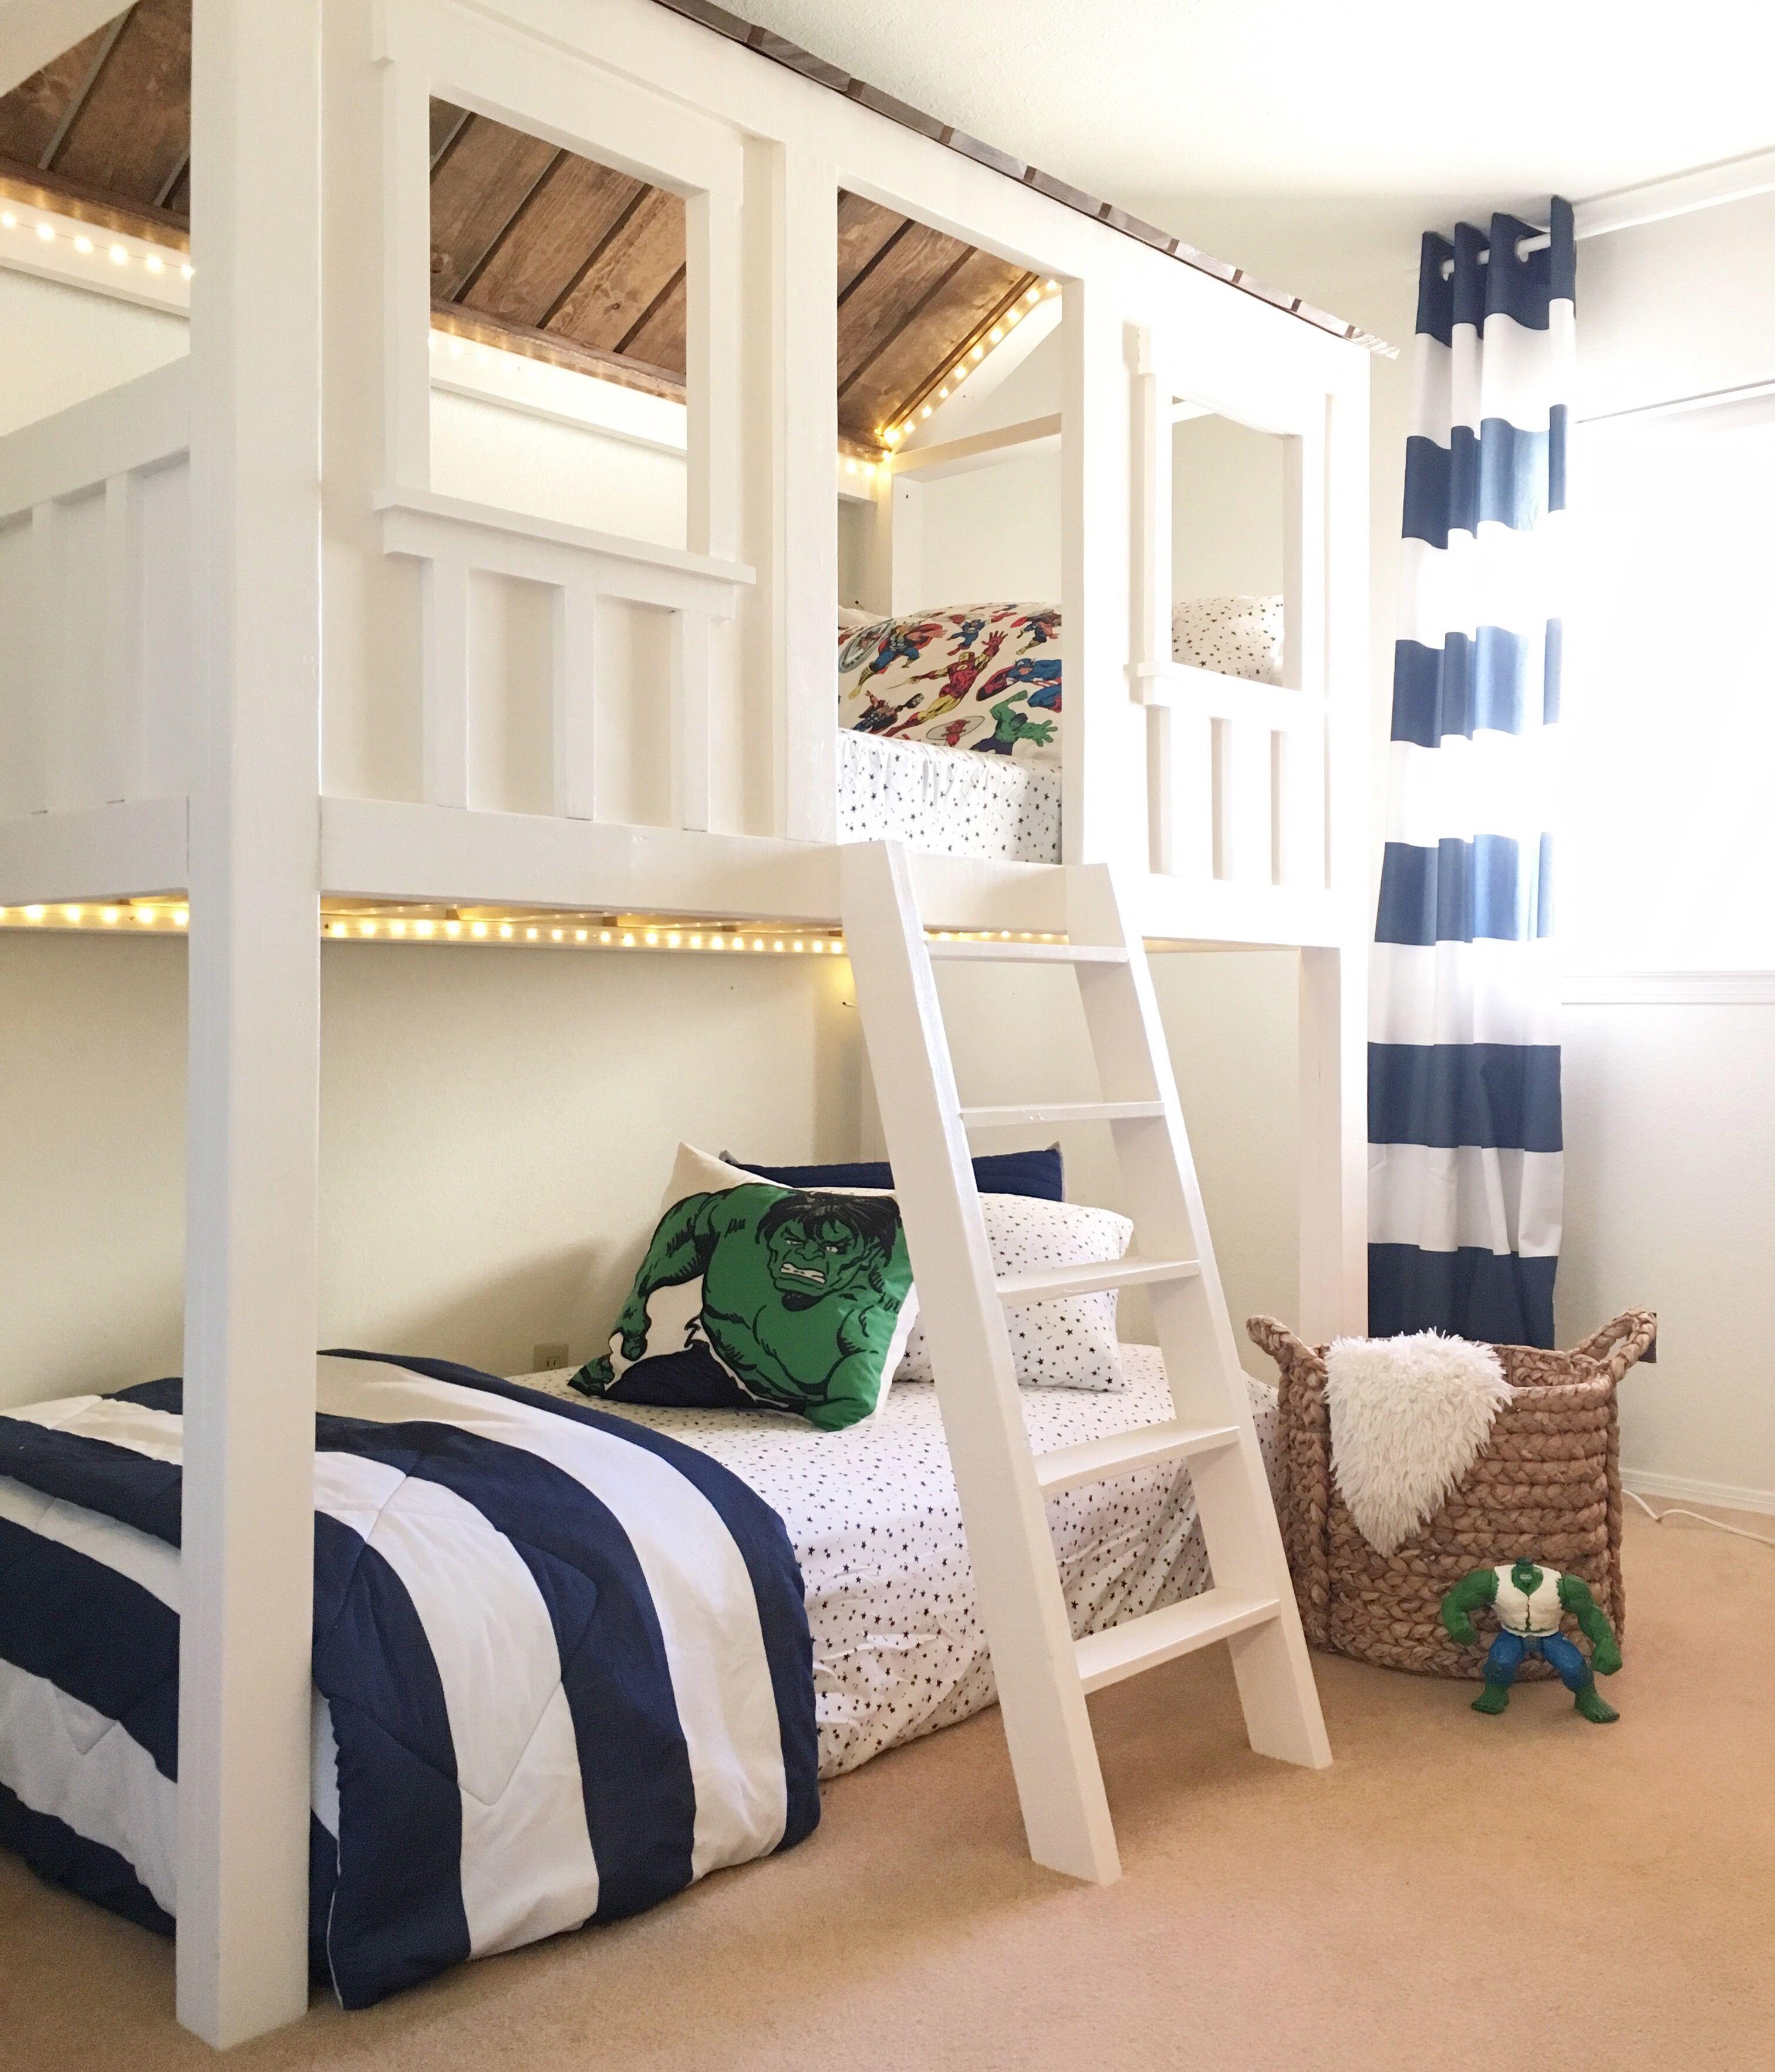 Loft Cabin Bed Ana White in 2020 Loft bed plans, Diy